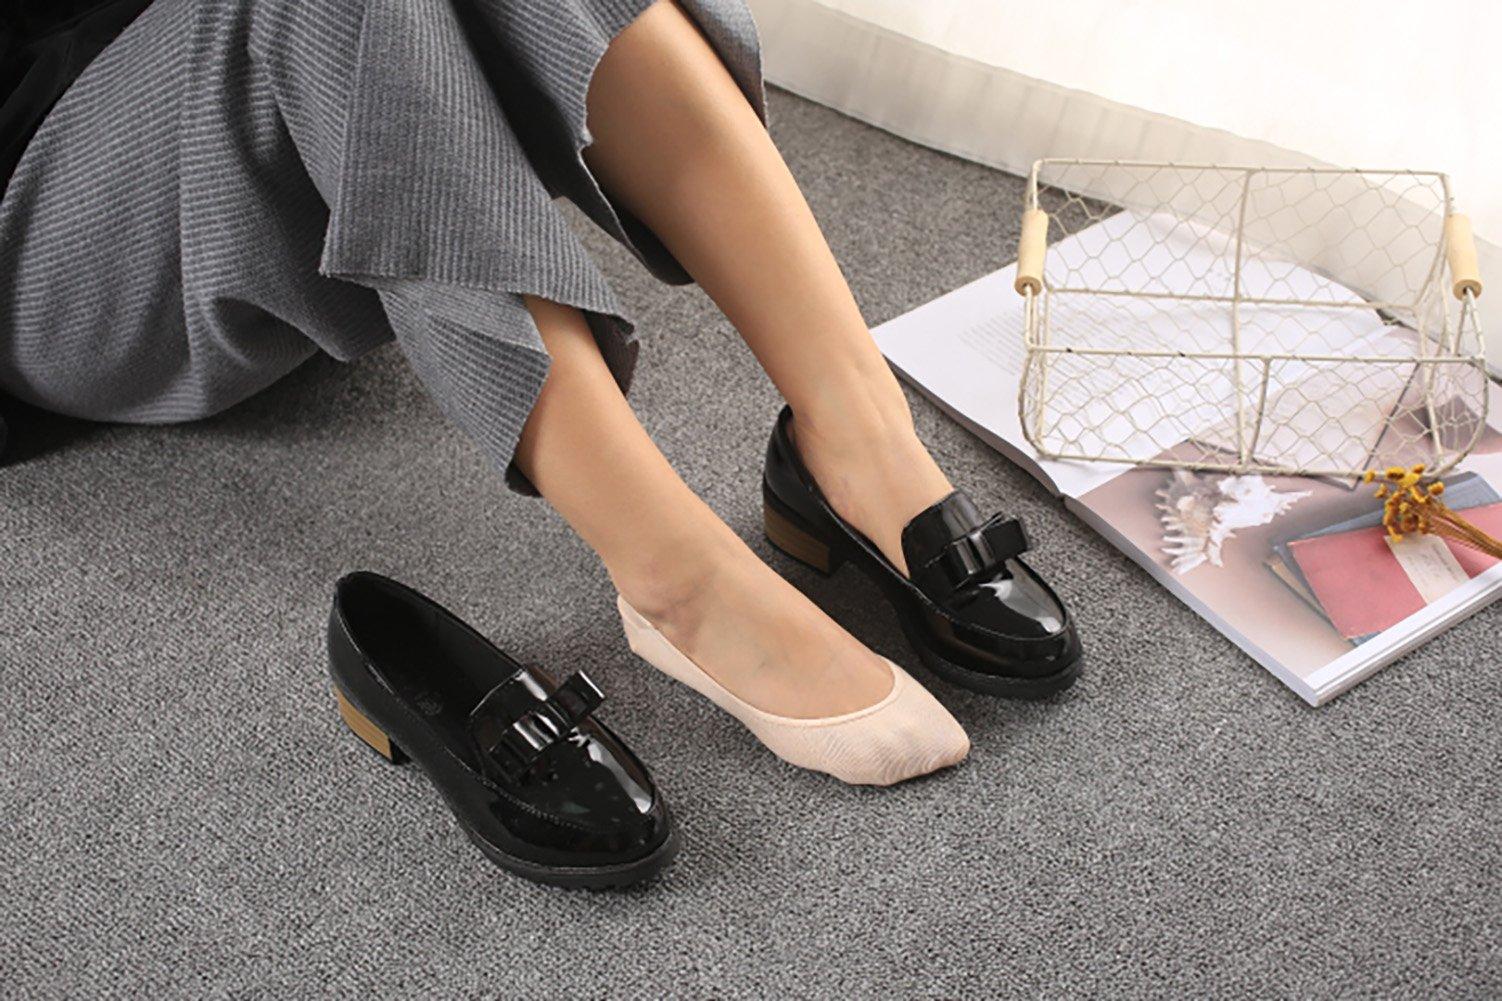 Women No Show Socks Cotton Liner Socks Non-Slip No Show Socks Low Cut Boat Socks 5-Pairs by Ayiran (Image #7)